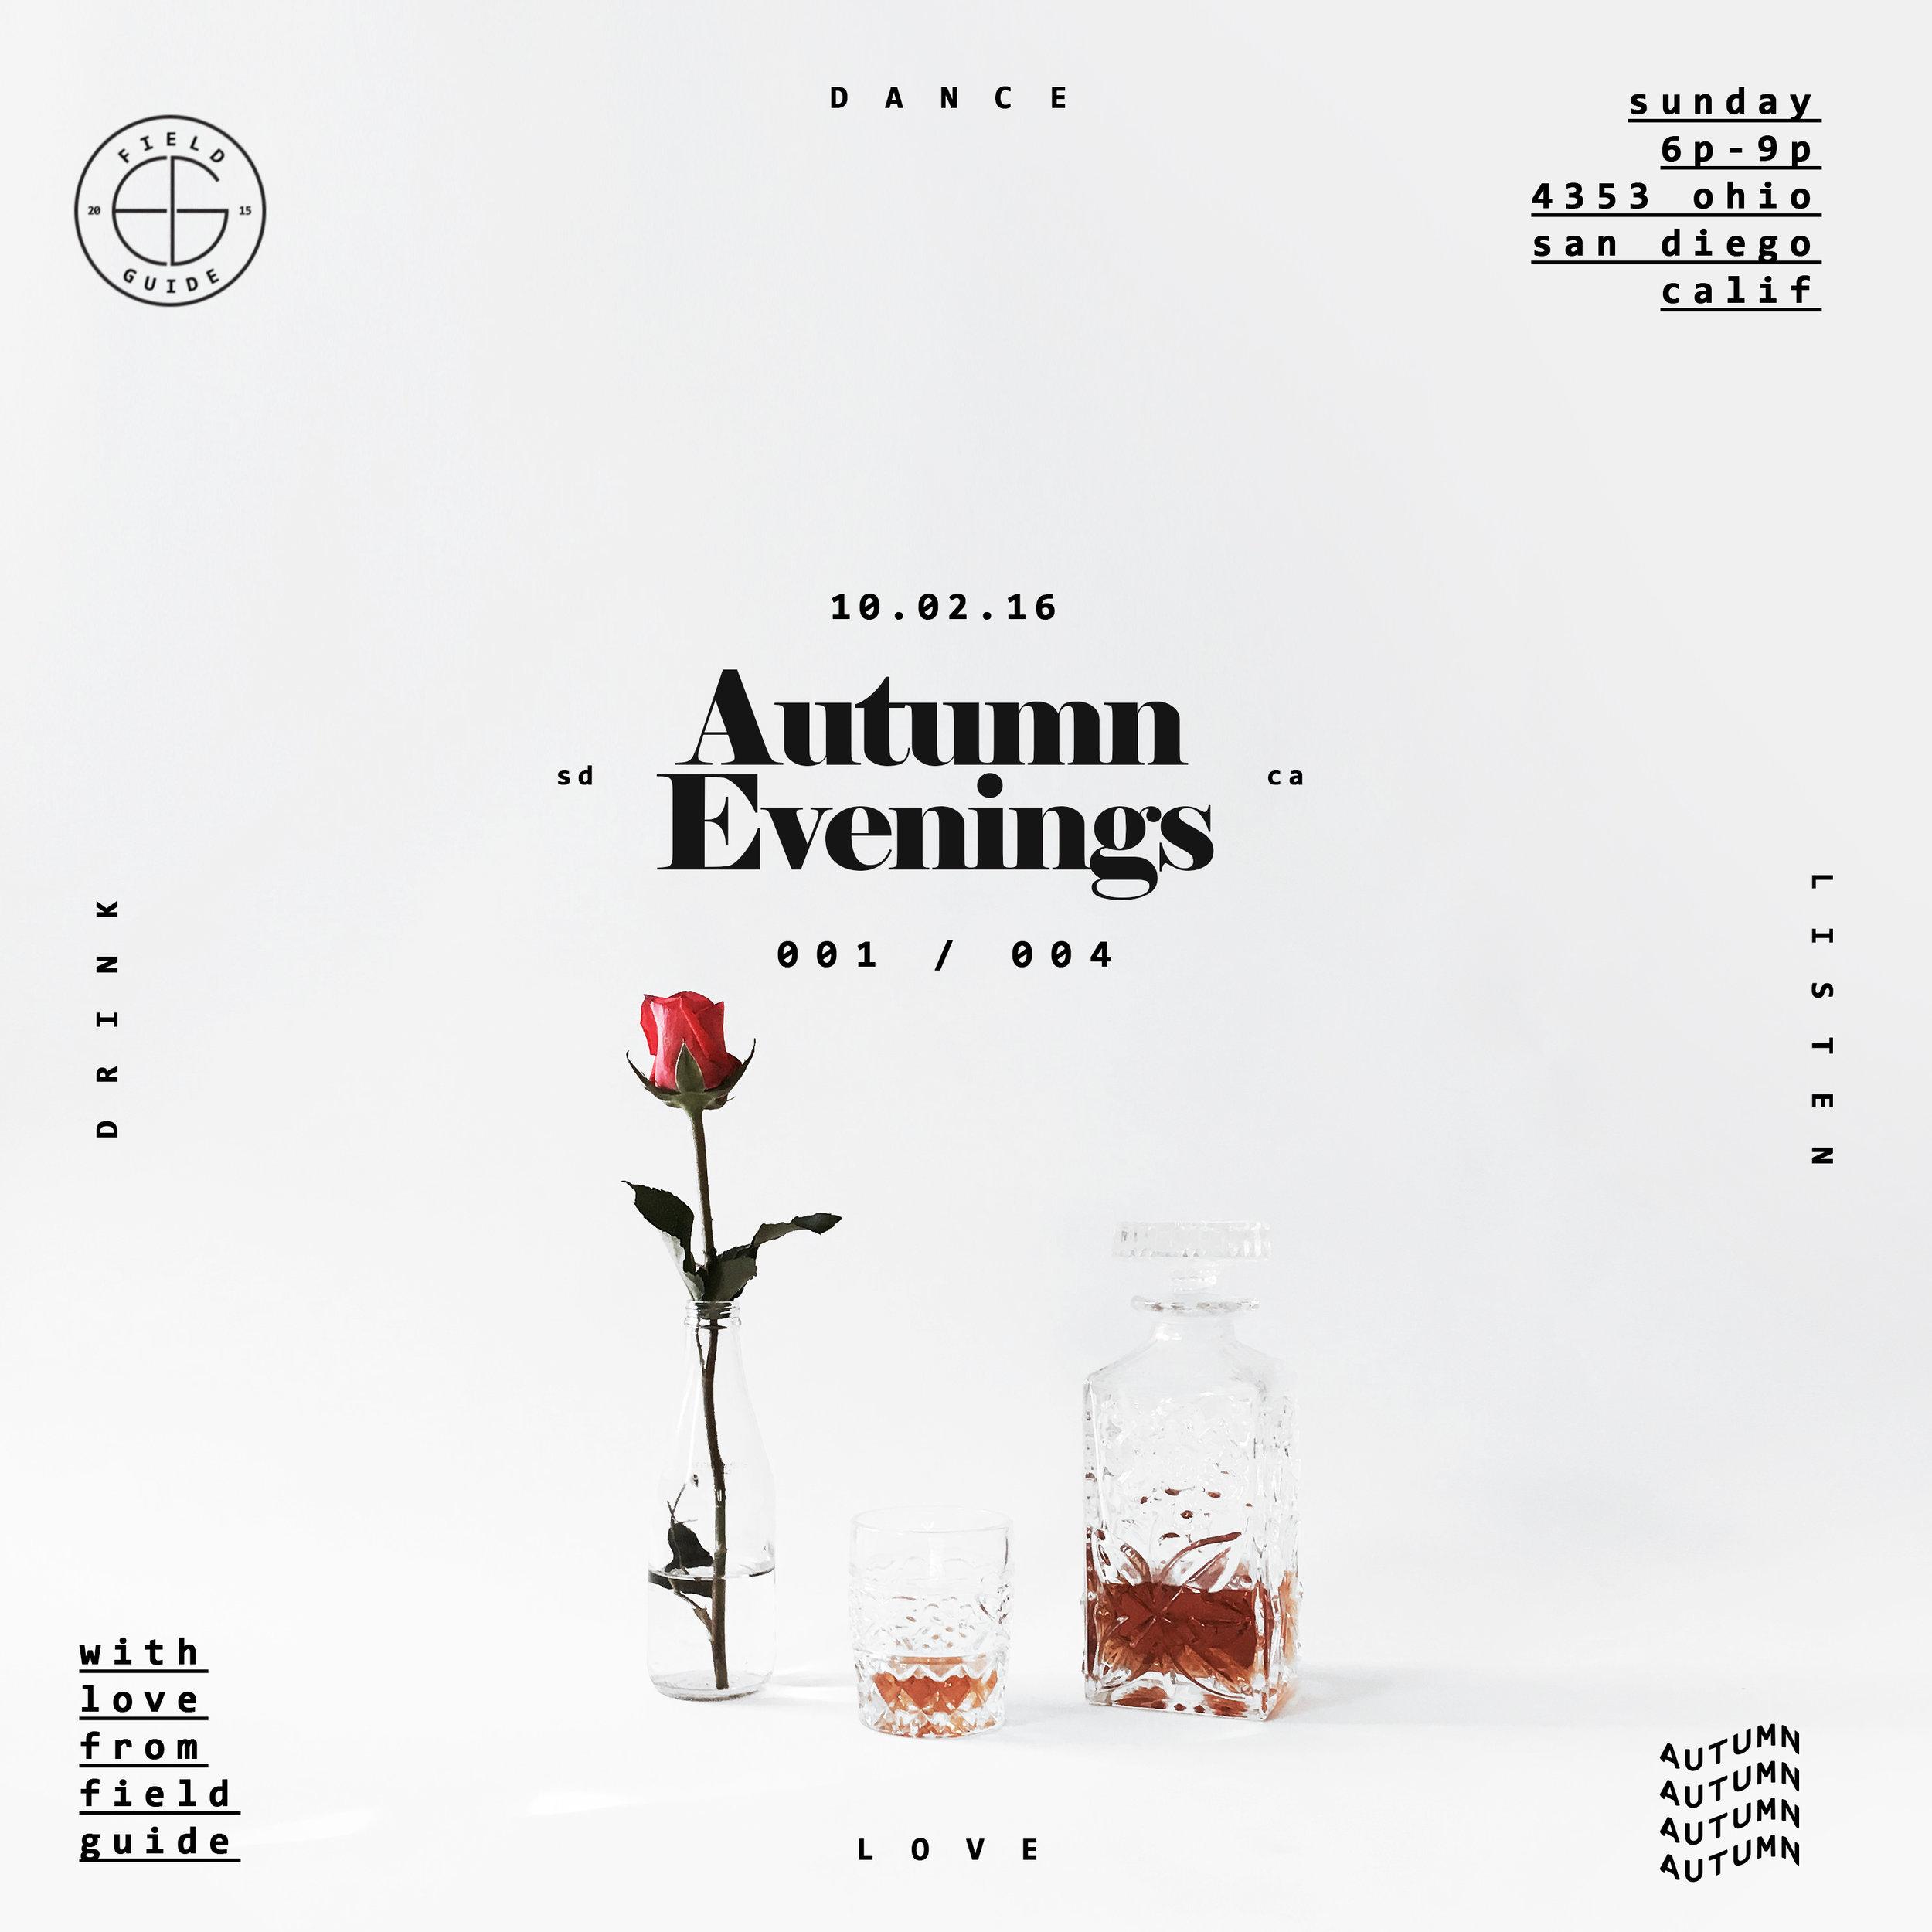 autumn evenings.jpg